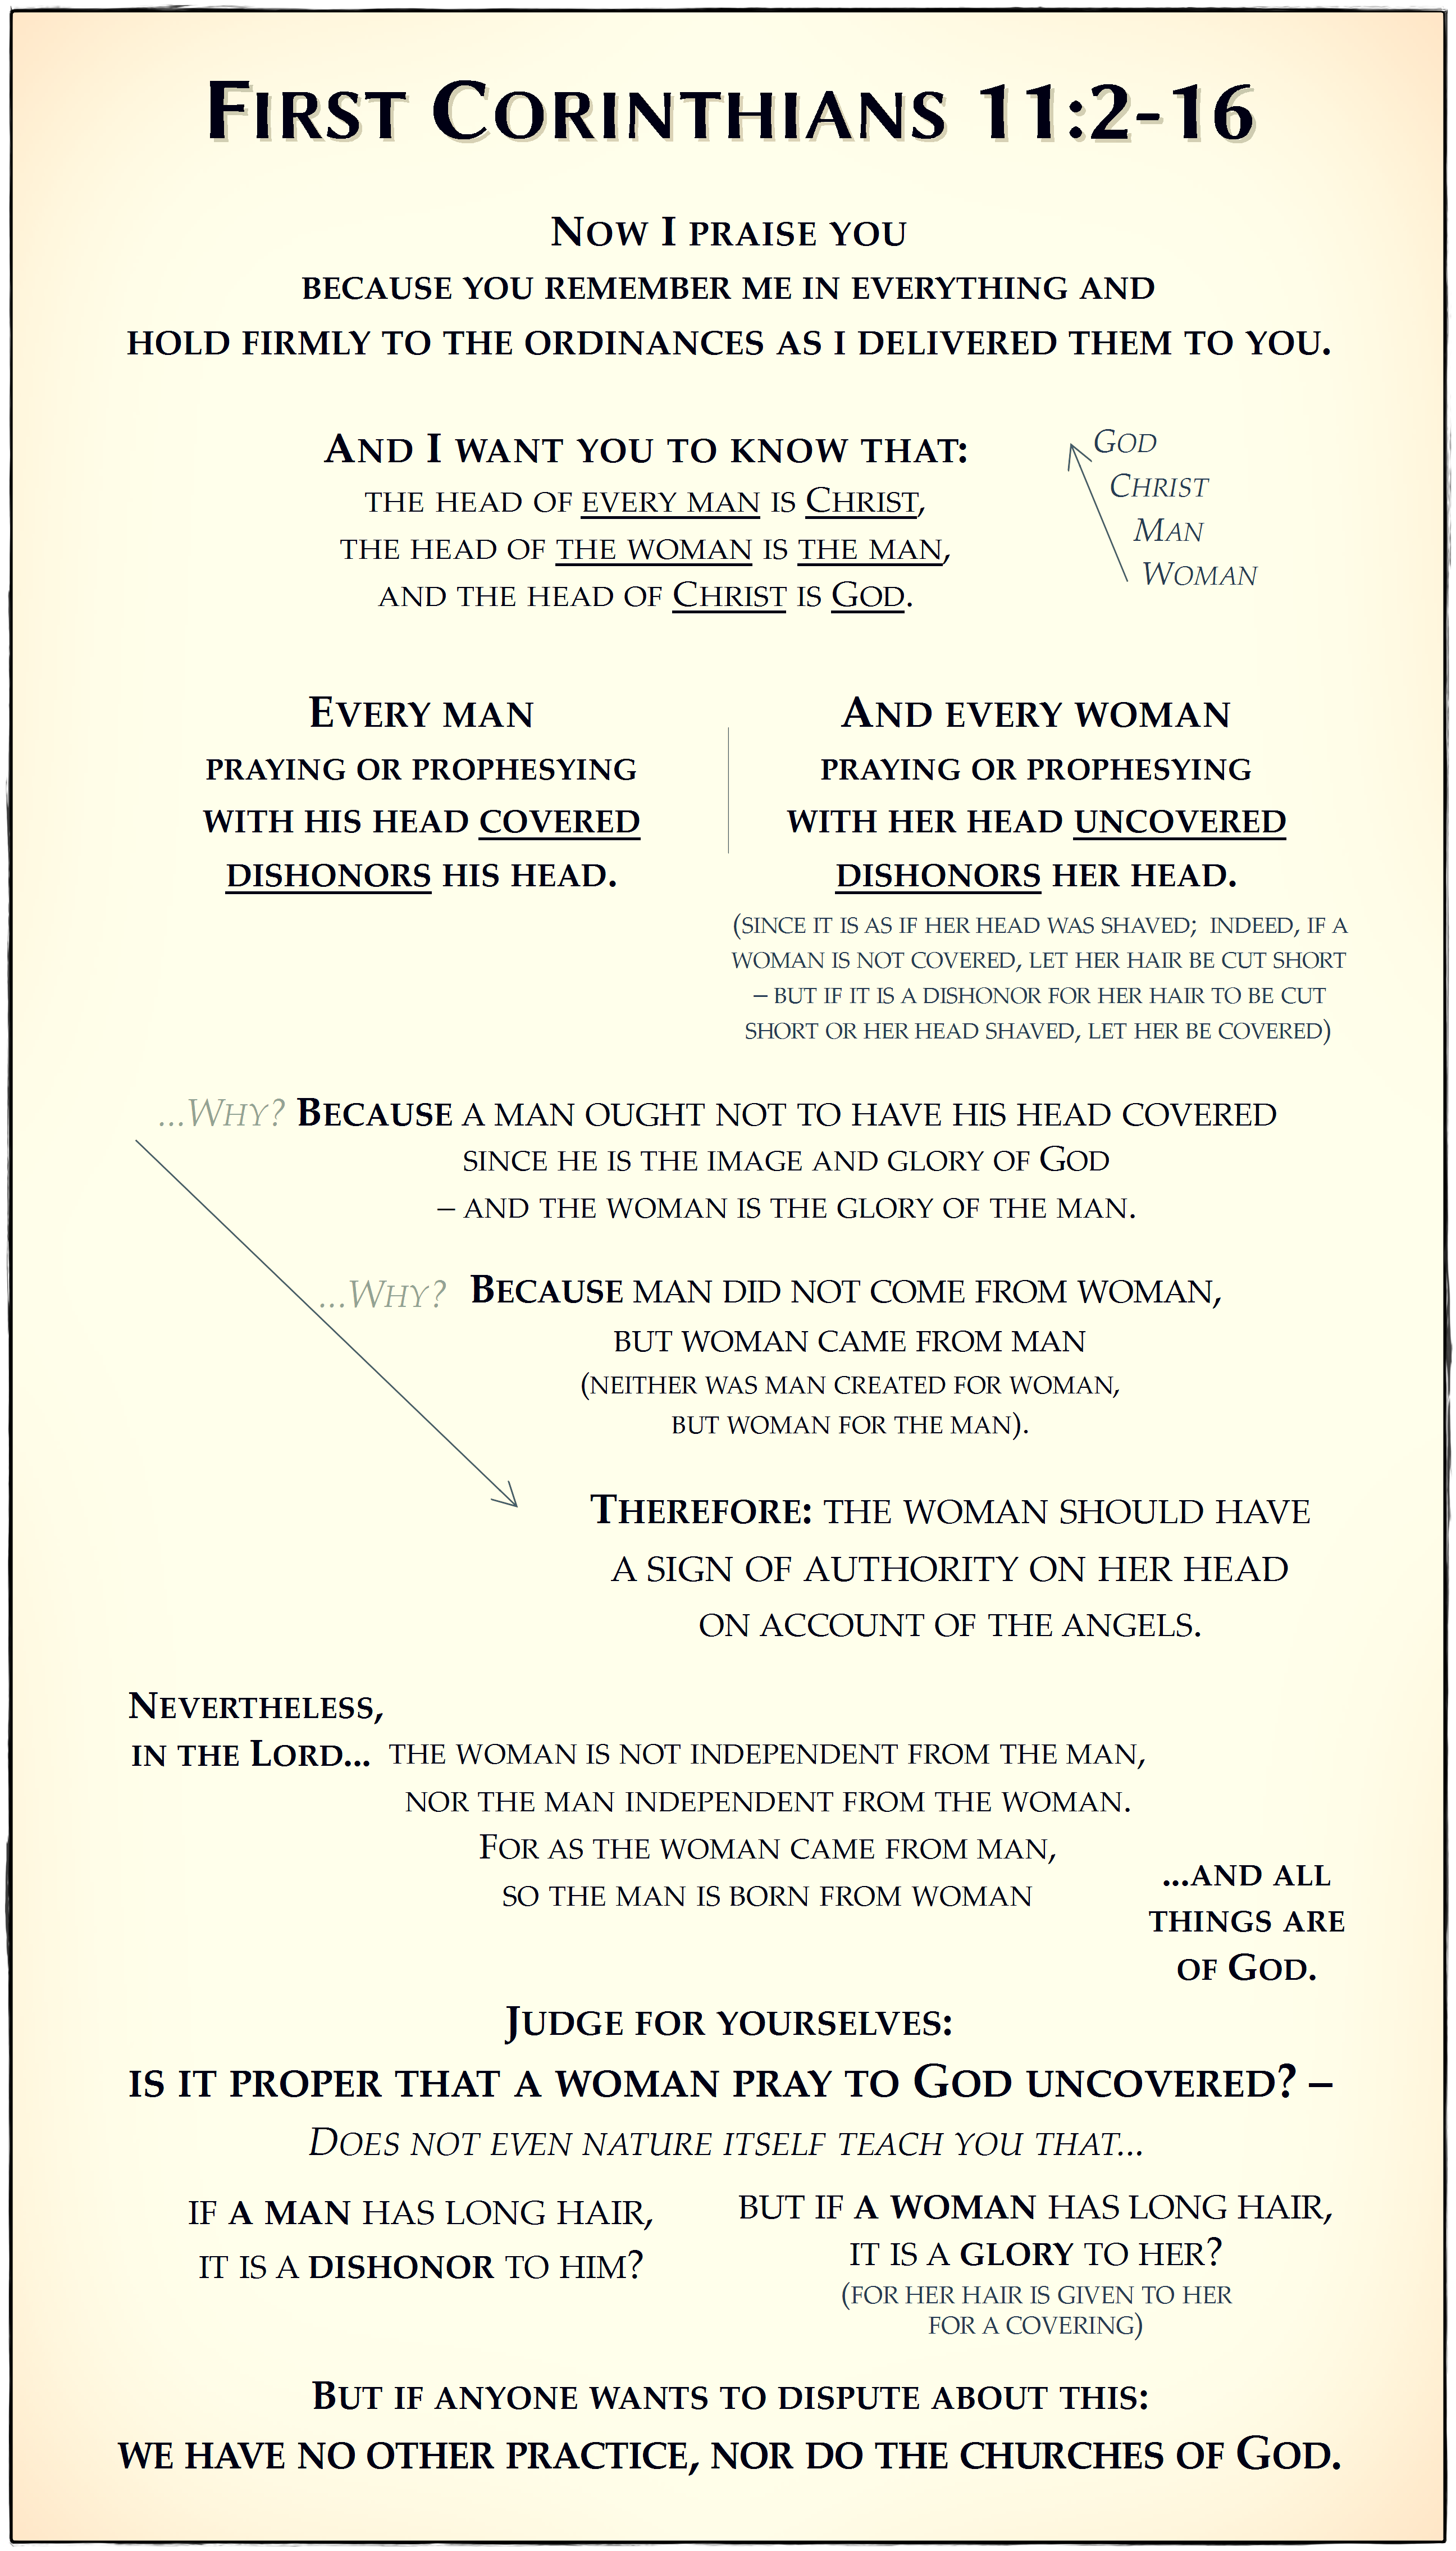 Visual Guide to 1 Corinthians 11